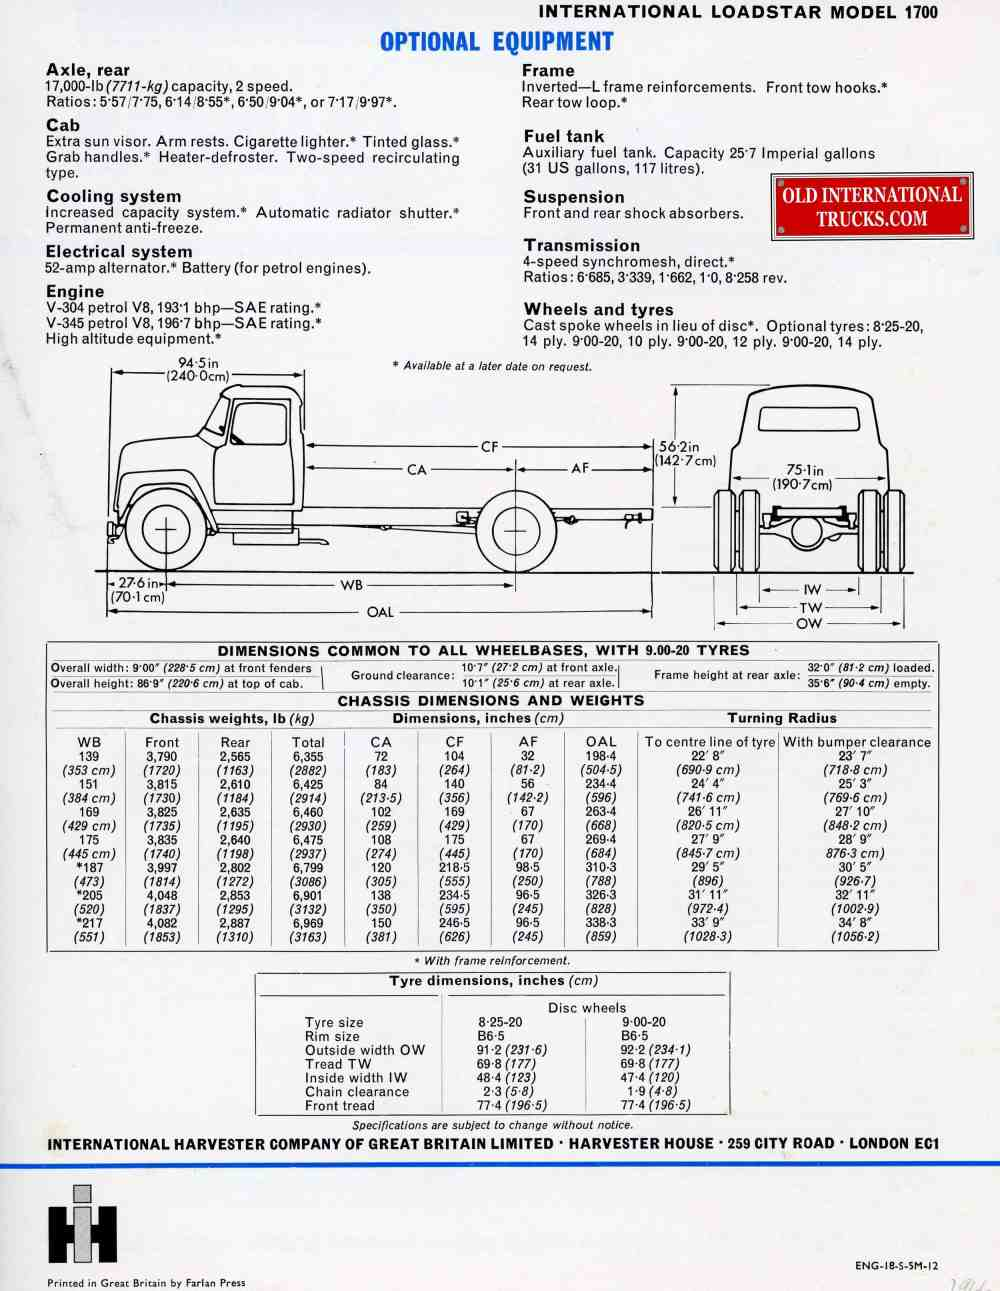 medium resolution of enchanting 1974 ih loadstar 1700 wiring diagram photos 1977 international